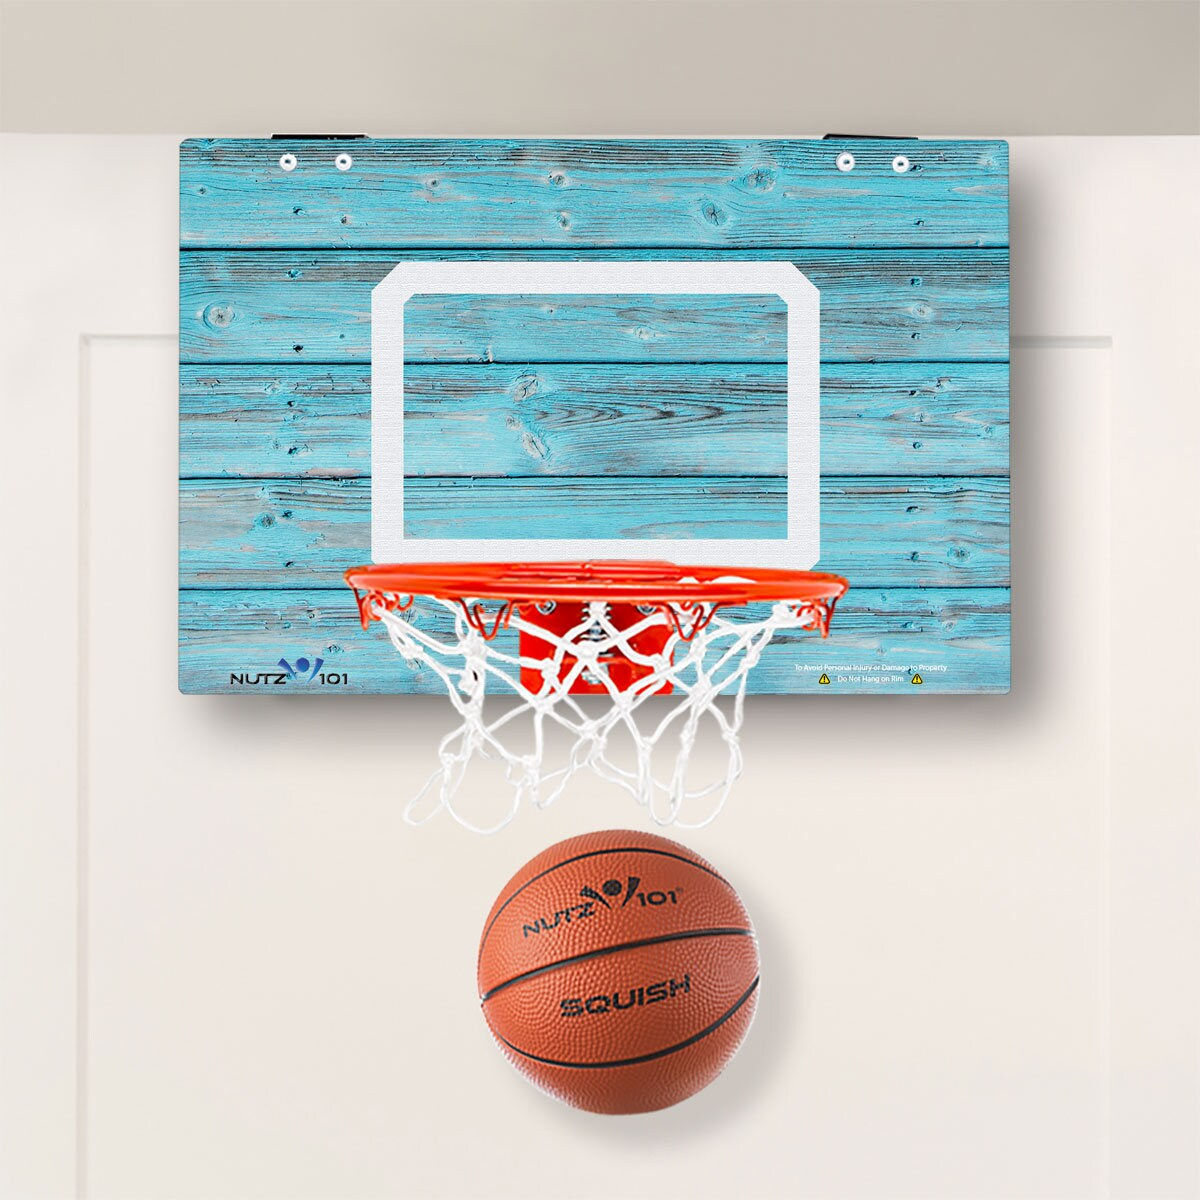 efcb37efc68 Custom Classic Rustic Beach Wood Imaged Mini Basketball Hoop | Etsy